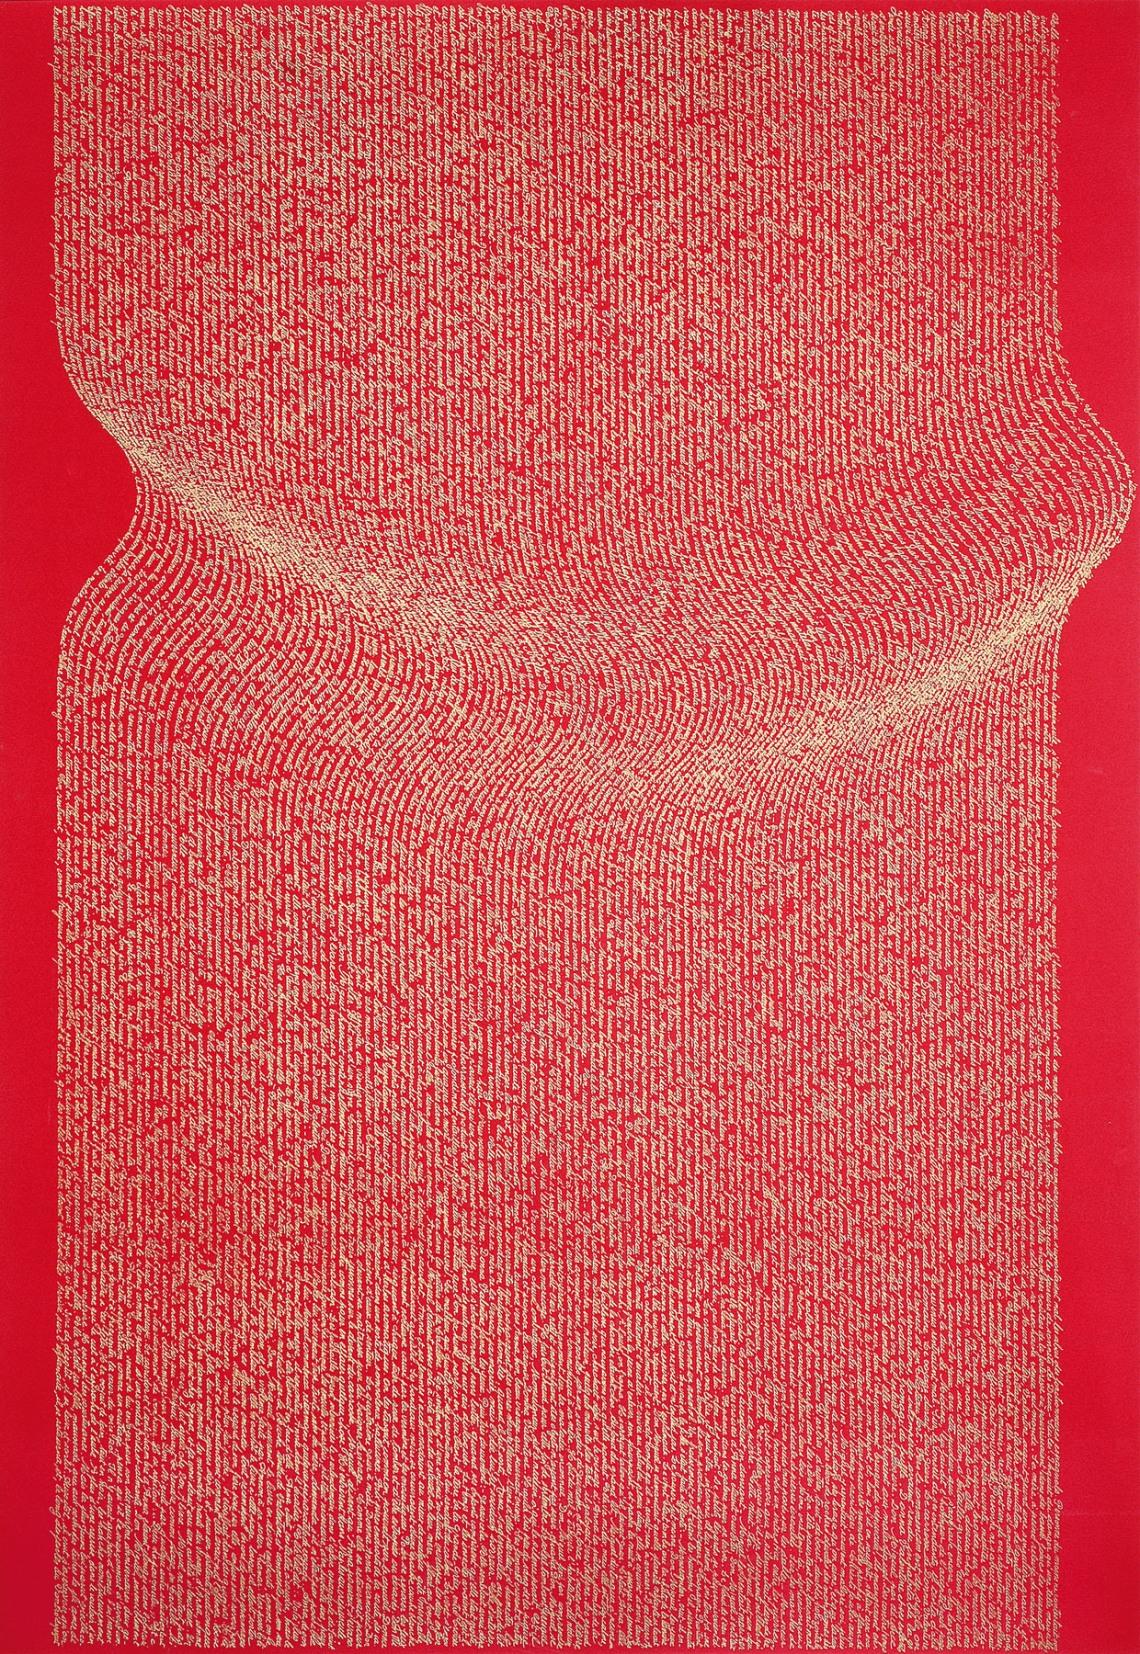 Calligramme - Marguerite Youcenar - Ana Sorror